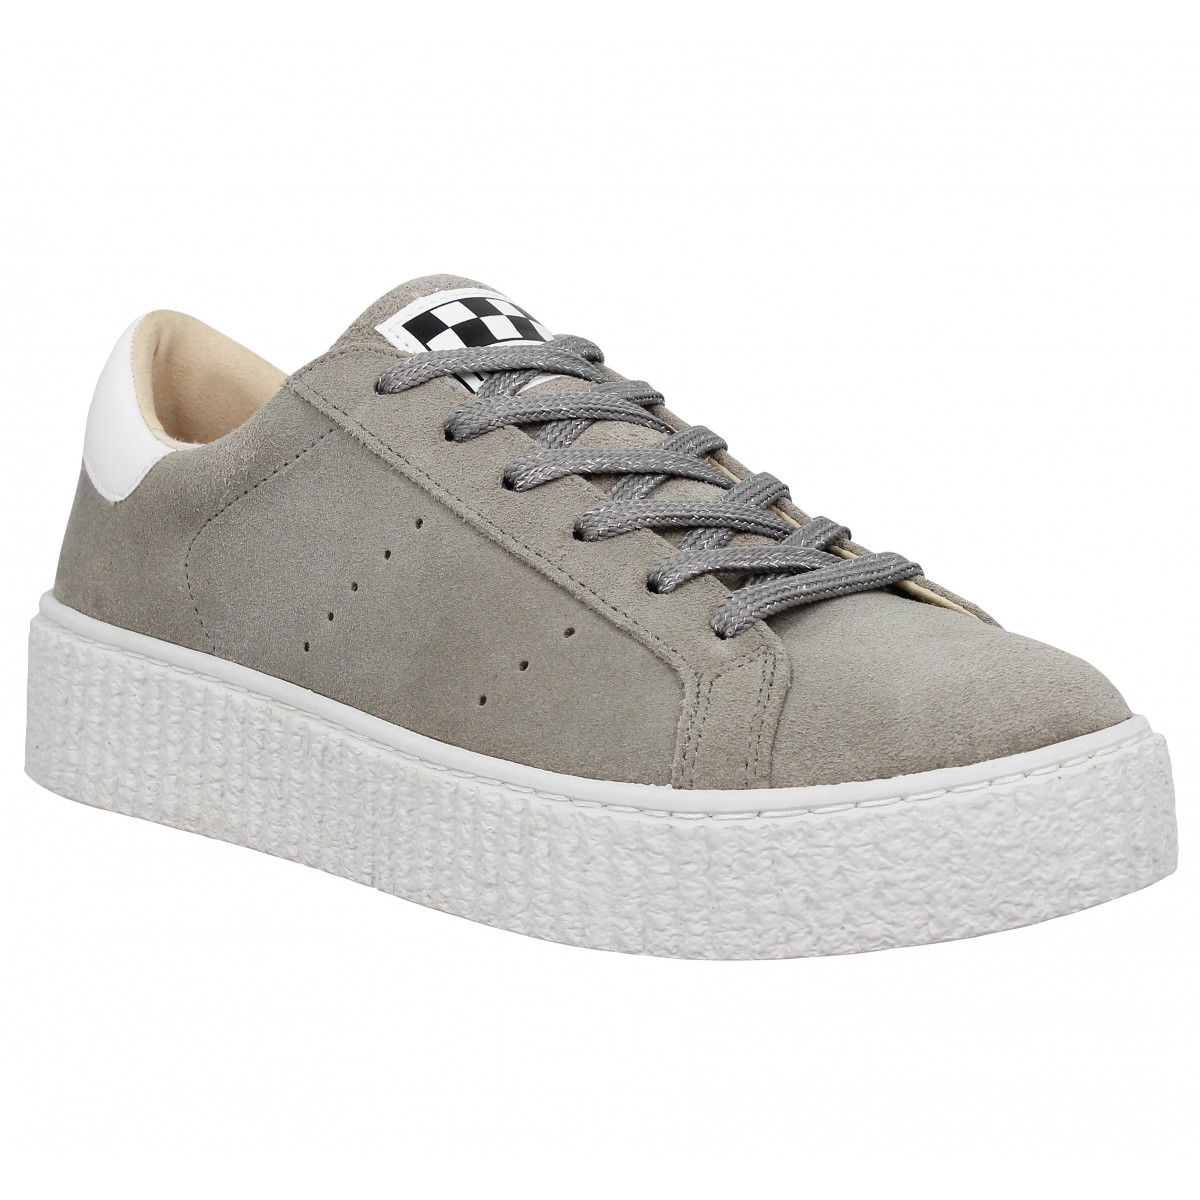 No Name Marque Picadilly Sneaker Suede...